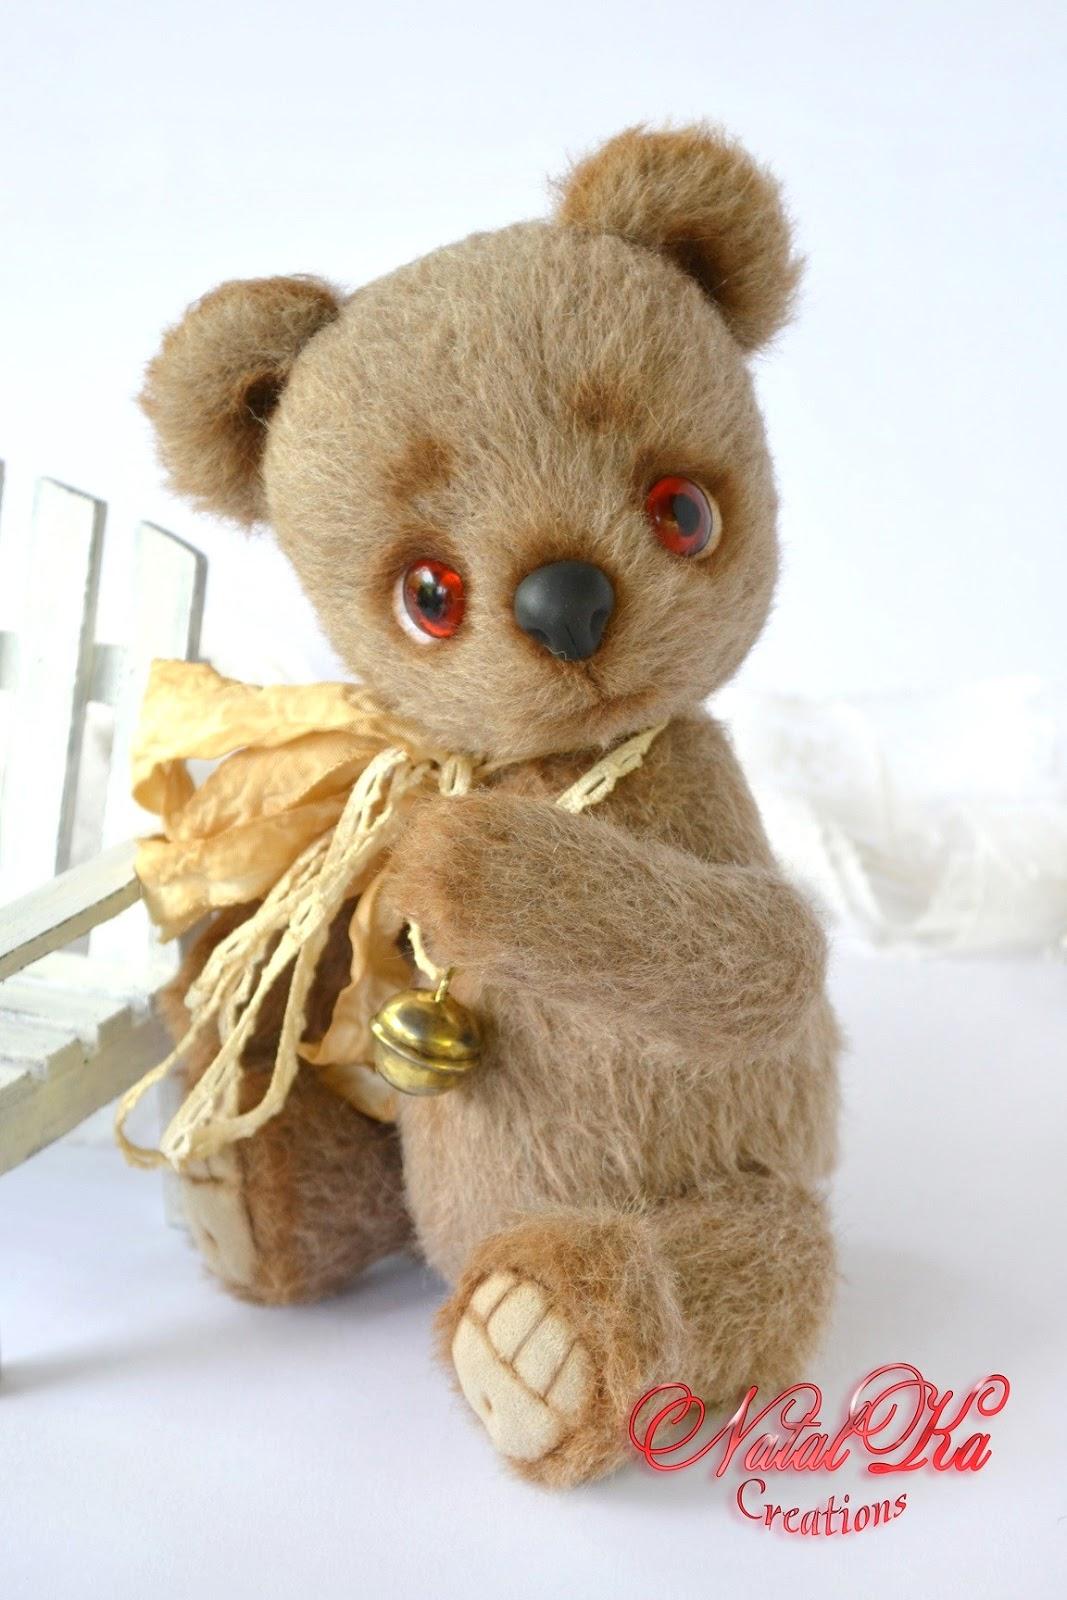 Авторский мишка теди медведь медвежонок из кашемира ручной работы от NatalKa Creations. Künstlerbär Bär Sammlerbär  Teddybär Teddy handgemacht von NatalKa Creations